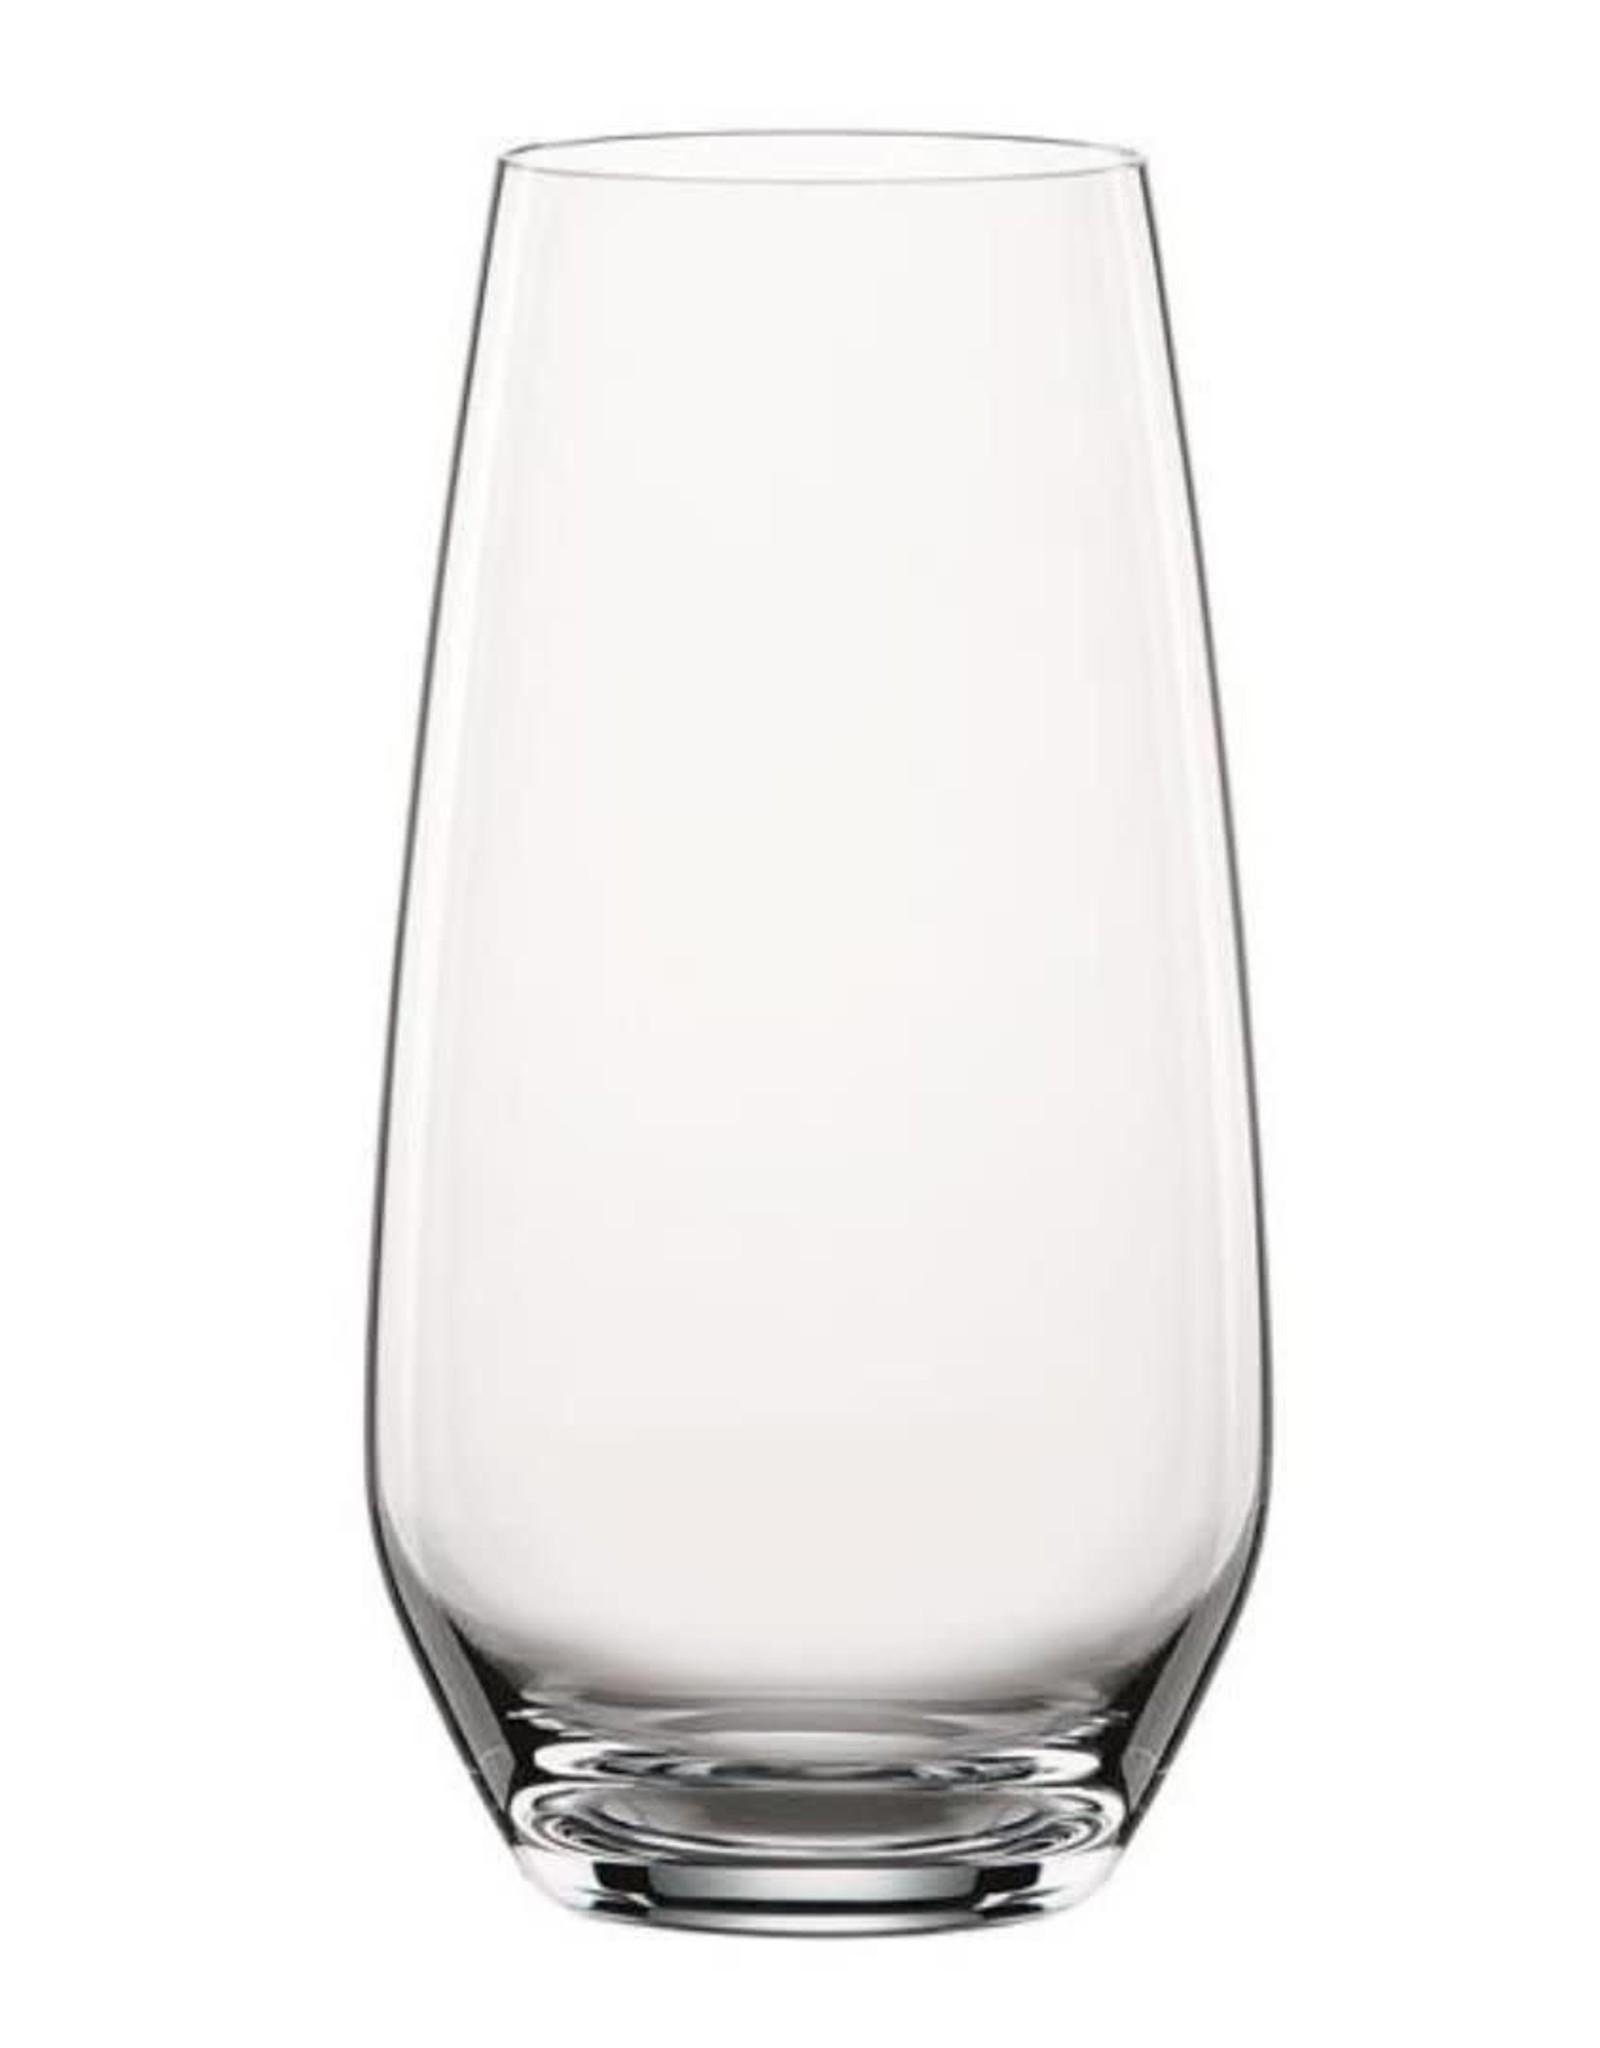 spiegelau Spiegelau. Authentis Universeel glas 550 ml, set à 6 stuks